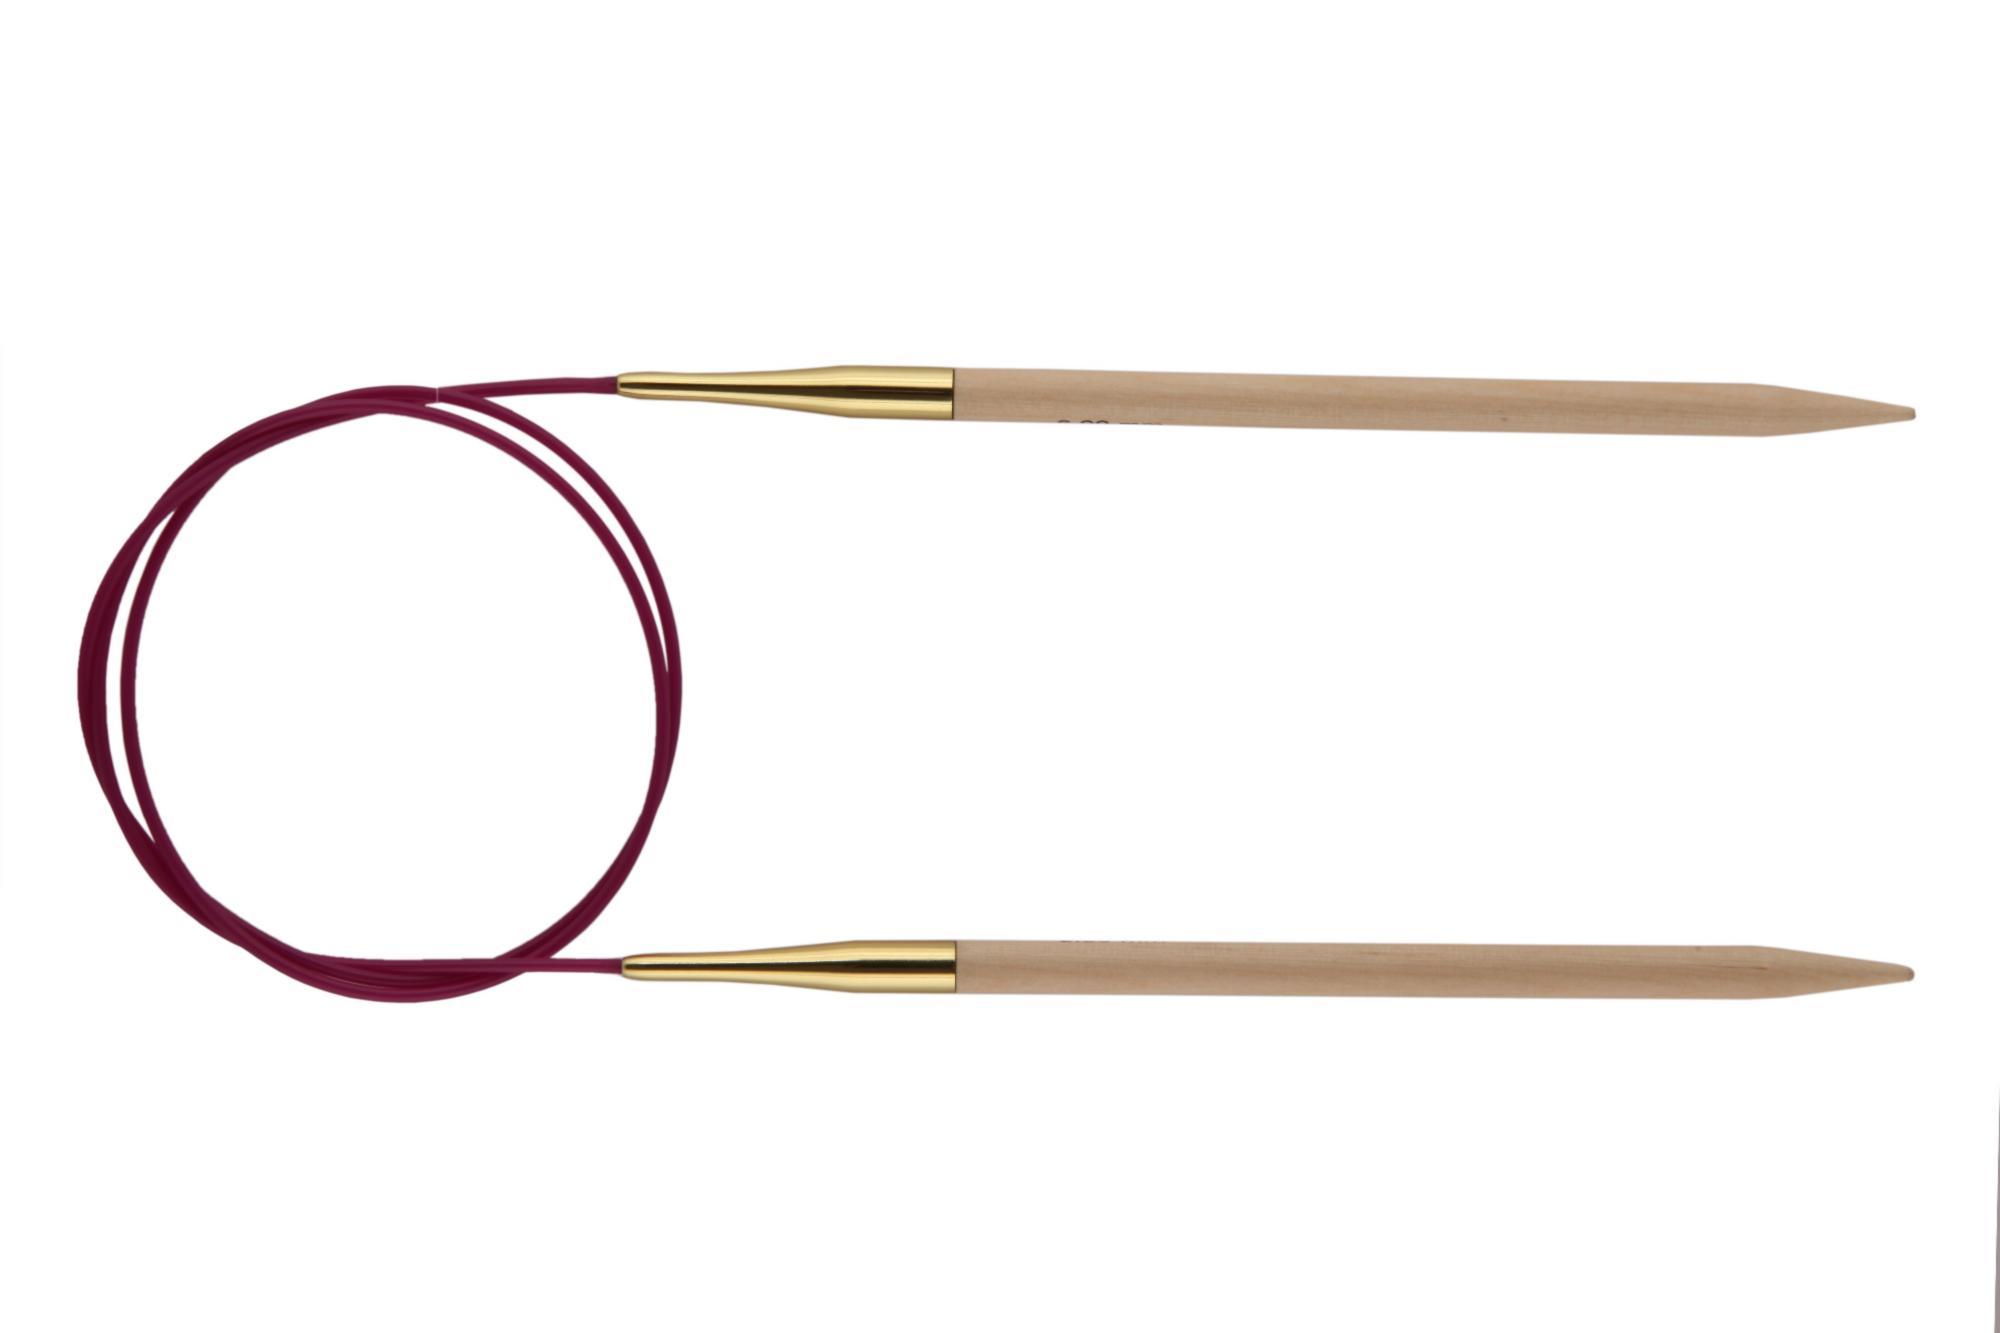 Спицы круговые 120 см Basix Birch Wood KnitPro, 35352, 6.00 мм